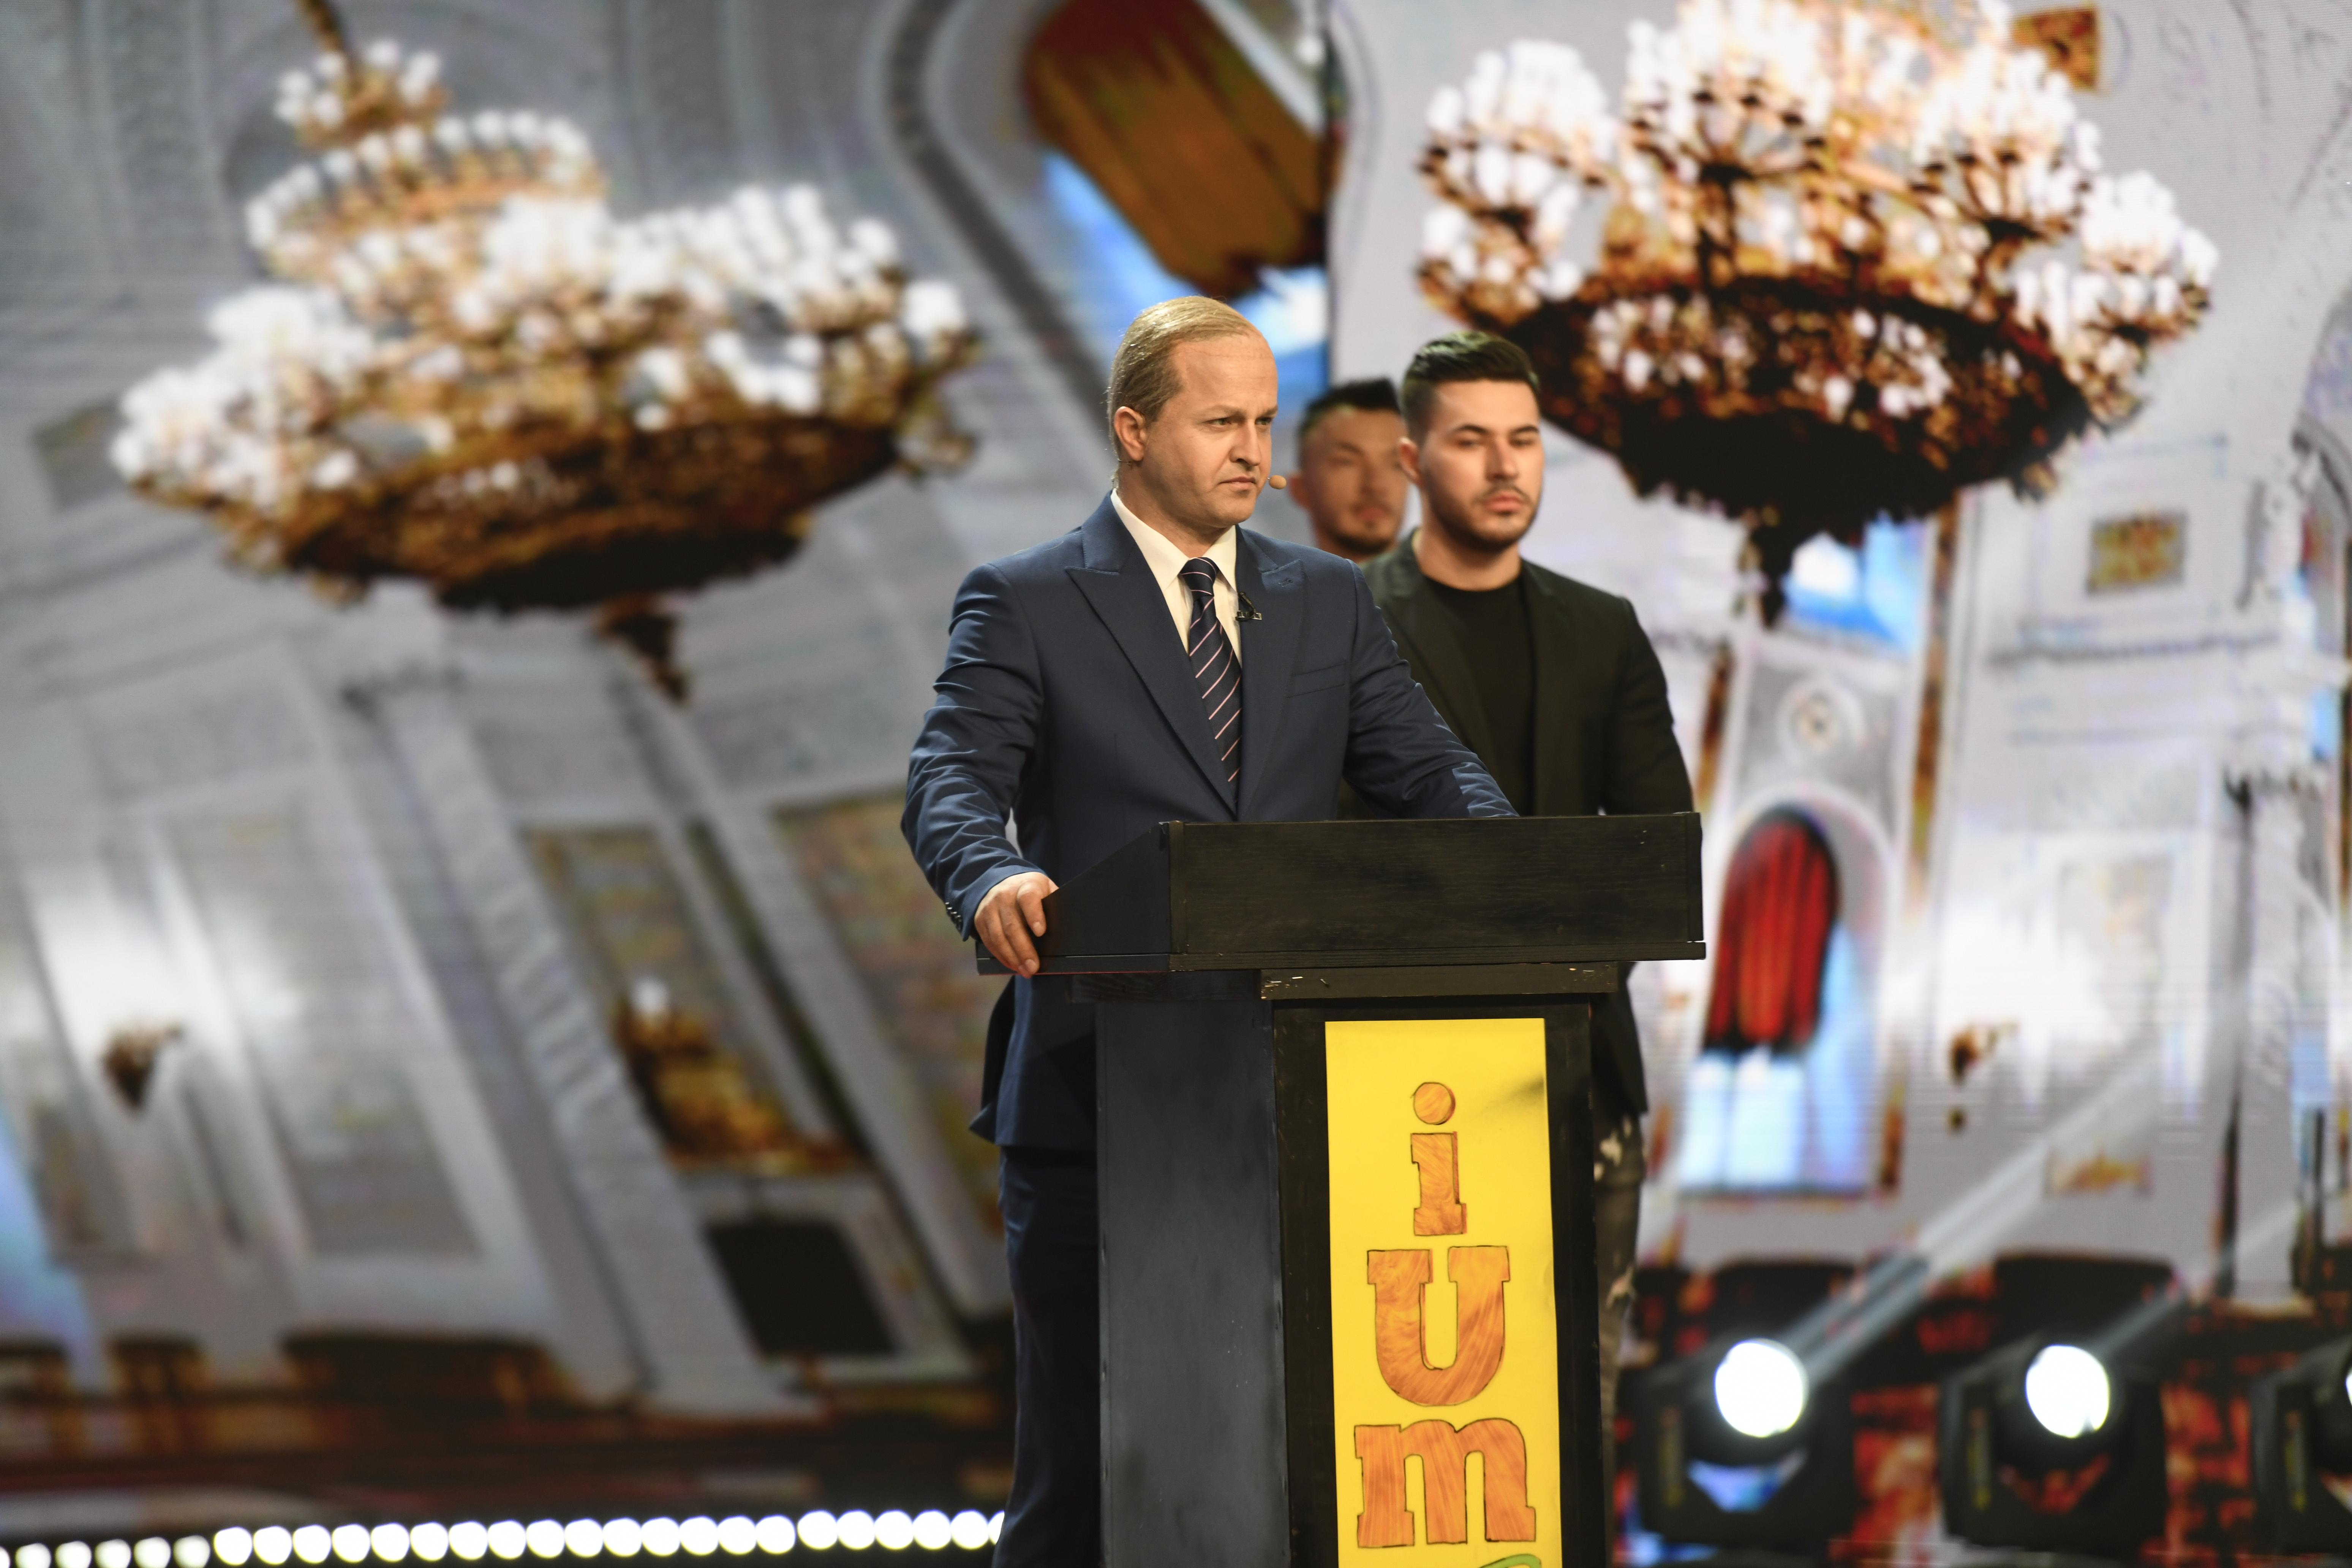 iUmor, 14 februarie 2021. Roast istoric la iUmor 10. Răzvan Oprea deghizat în Vladimir Putin ia cu asalt scena